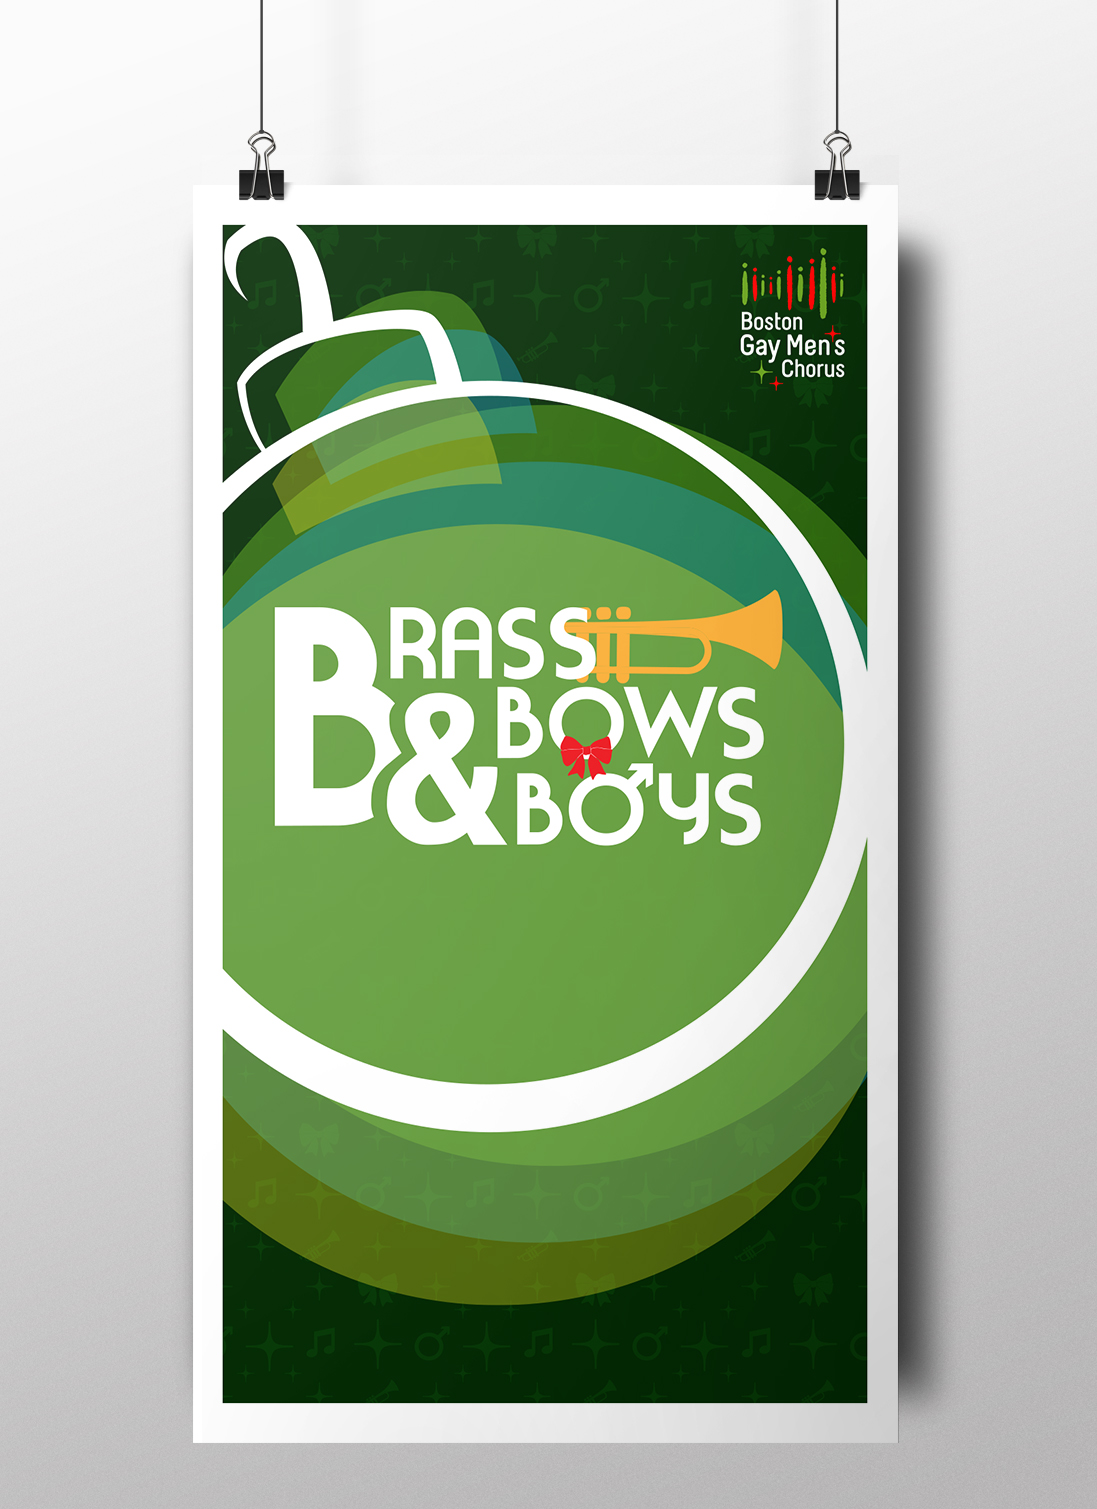 Brass & Bows & Boys_Boston Gay Mens Chorus_WEB.jpg